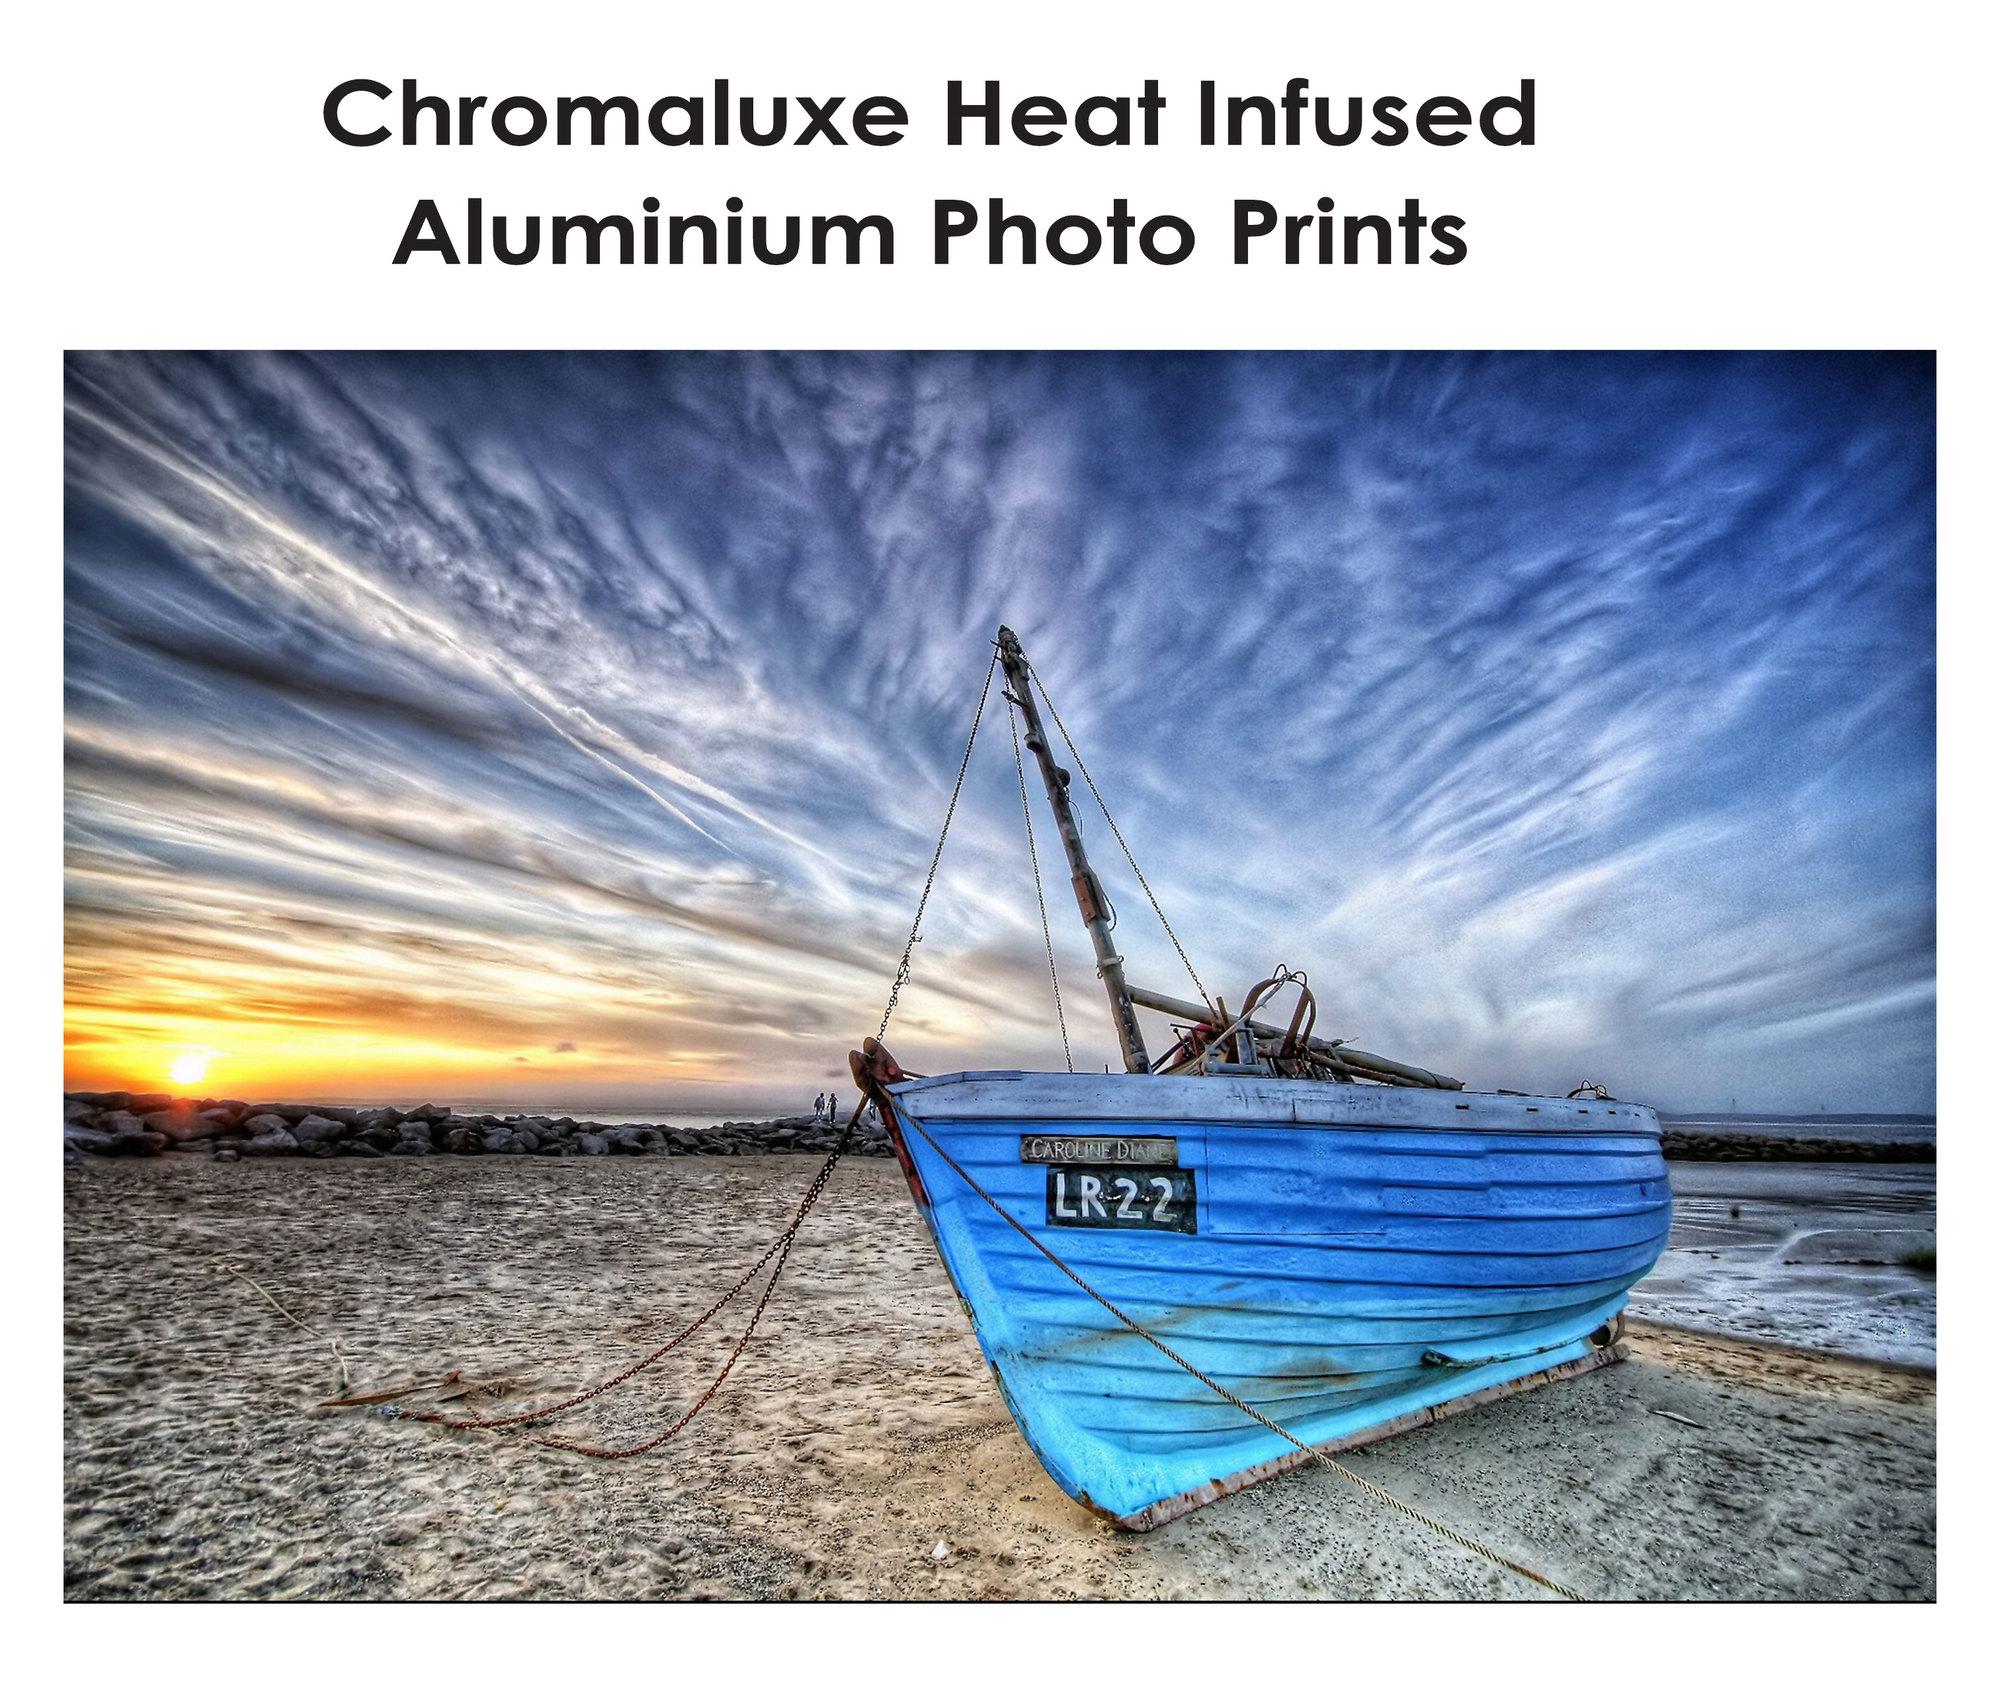 Chromaluxe Heat Infused Aluminium Photo Prints